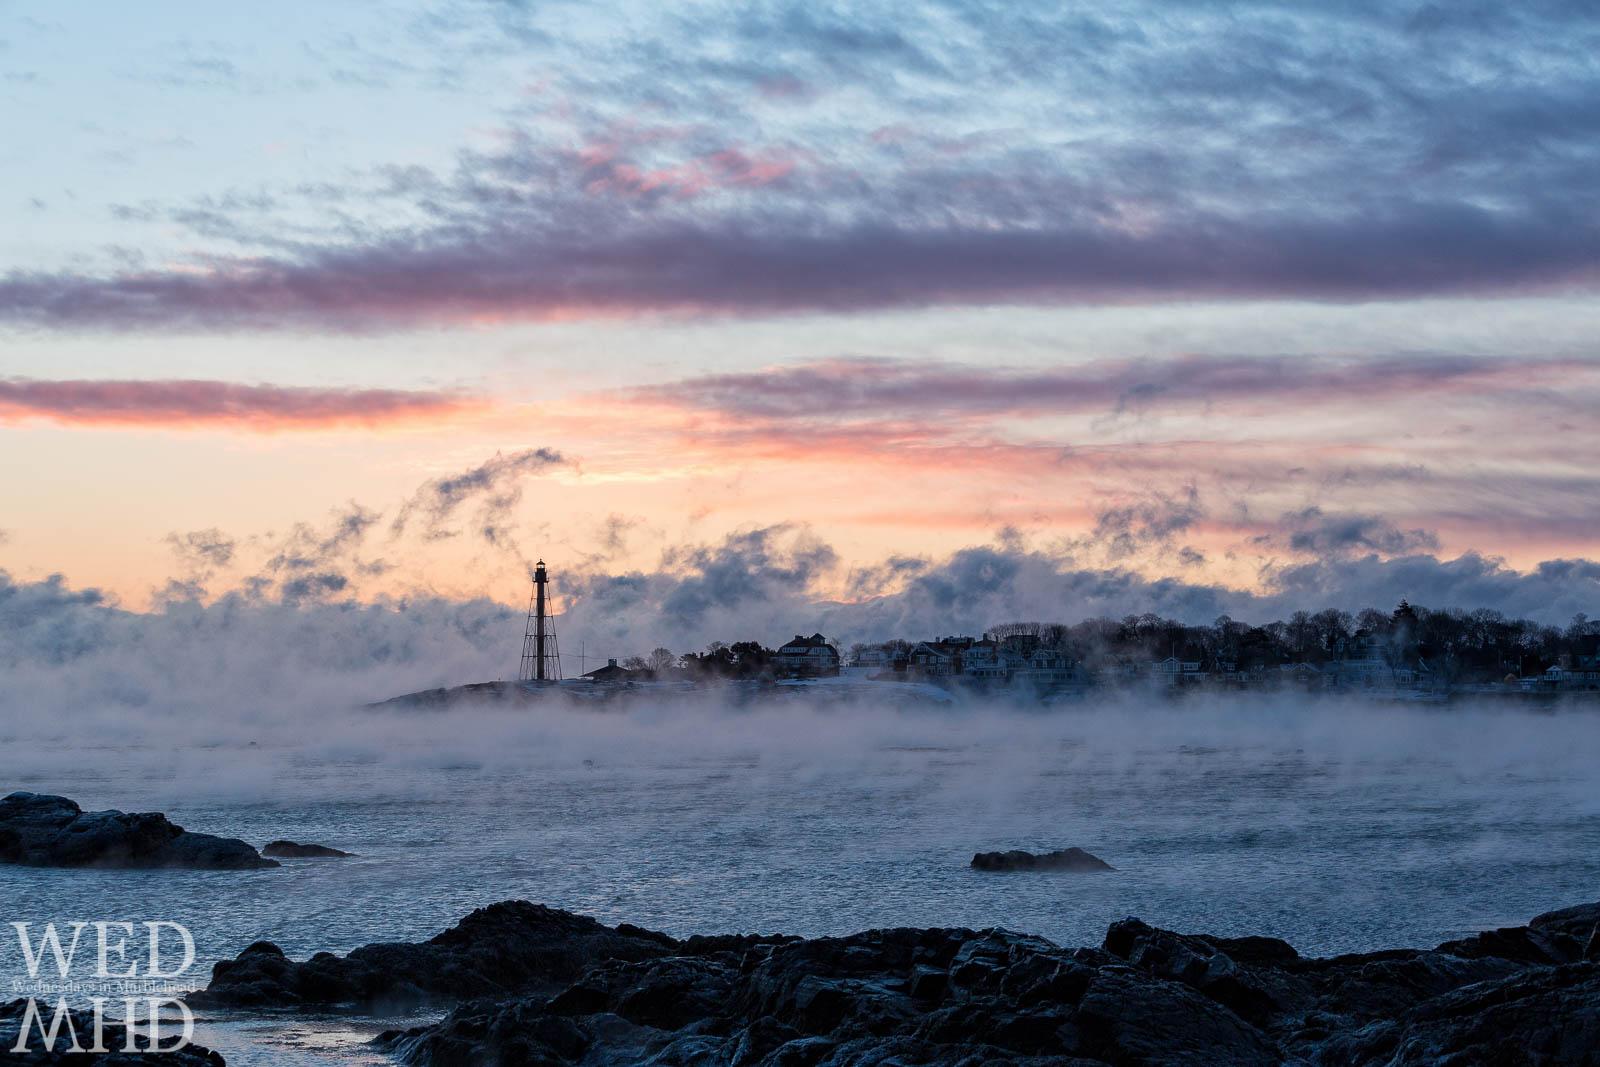 Sea Smoke - Wednesdays in Marblehead | title